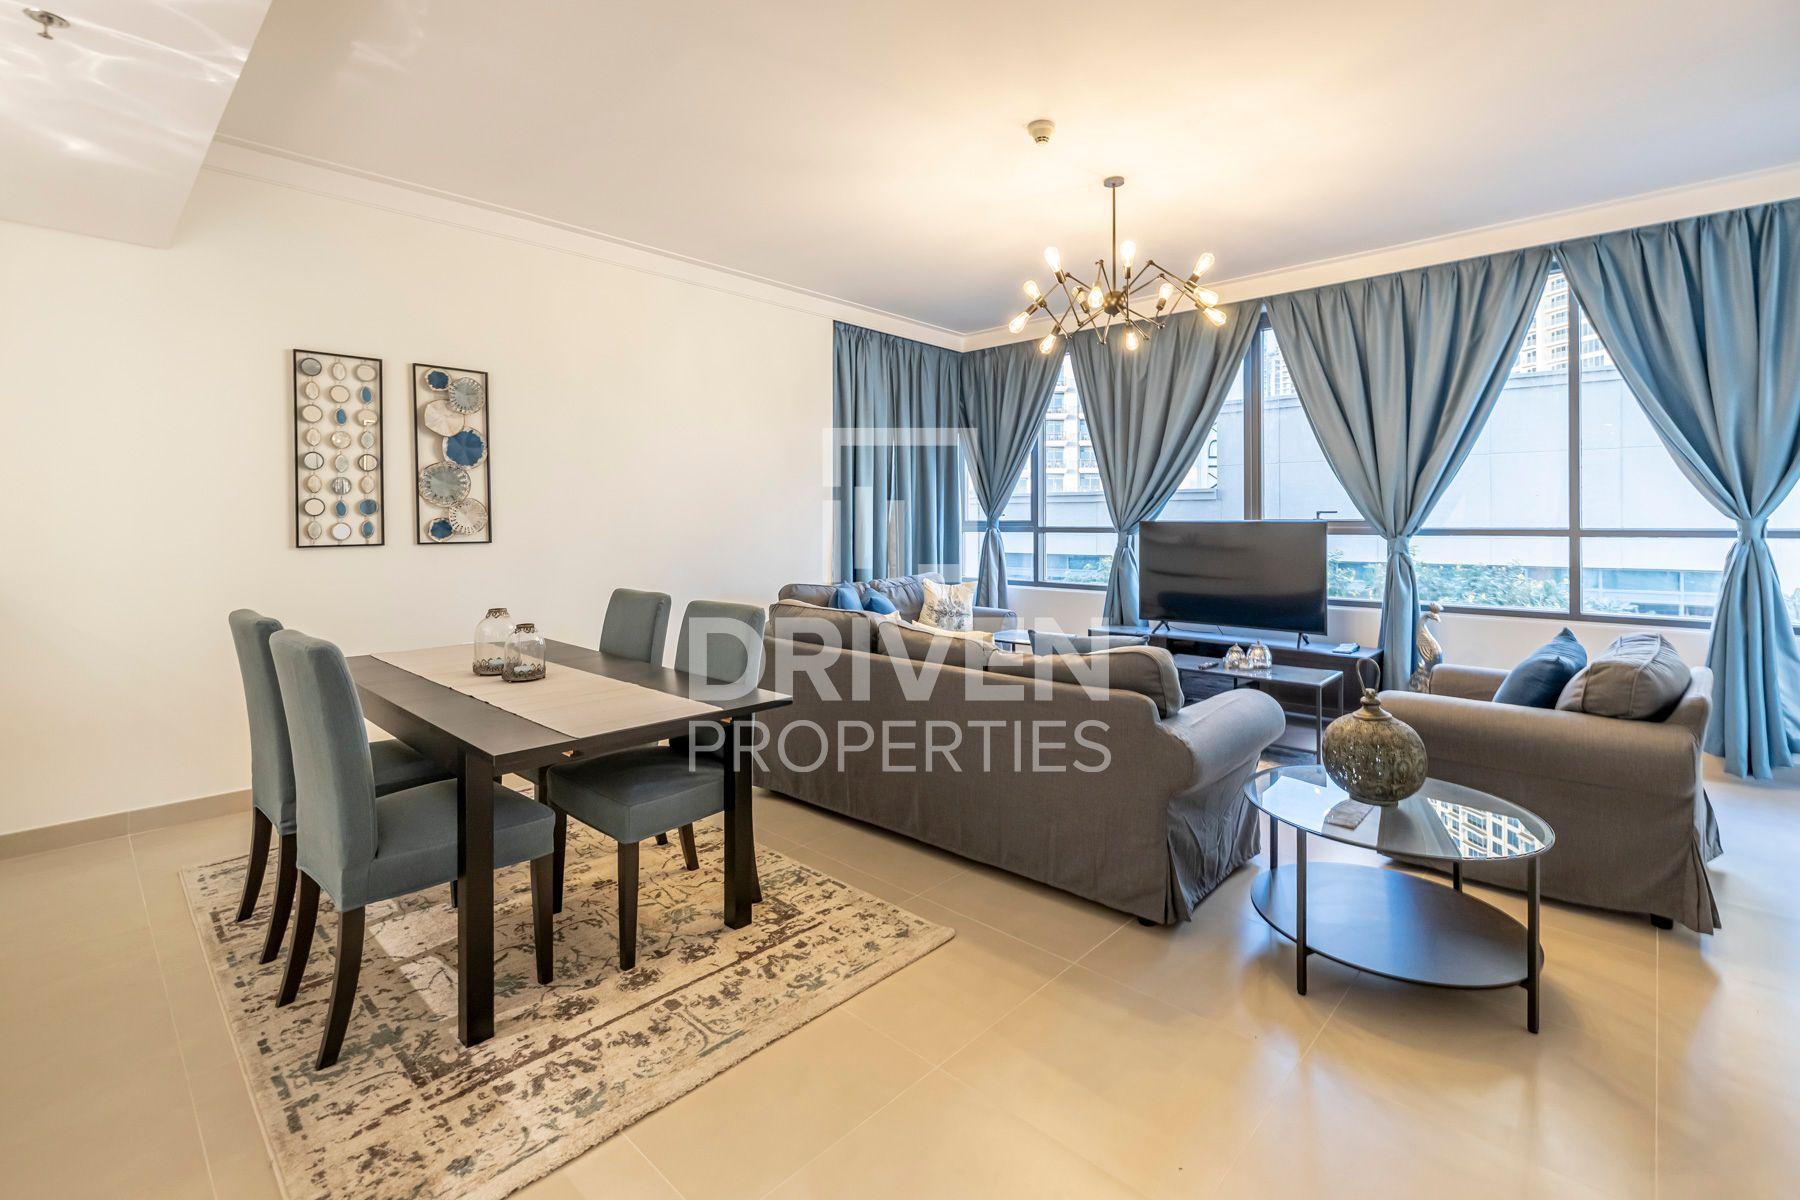 Apartment for Rent in Dubai Creek Residence Tower 2 South - Dubai Creek Harbour